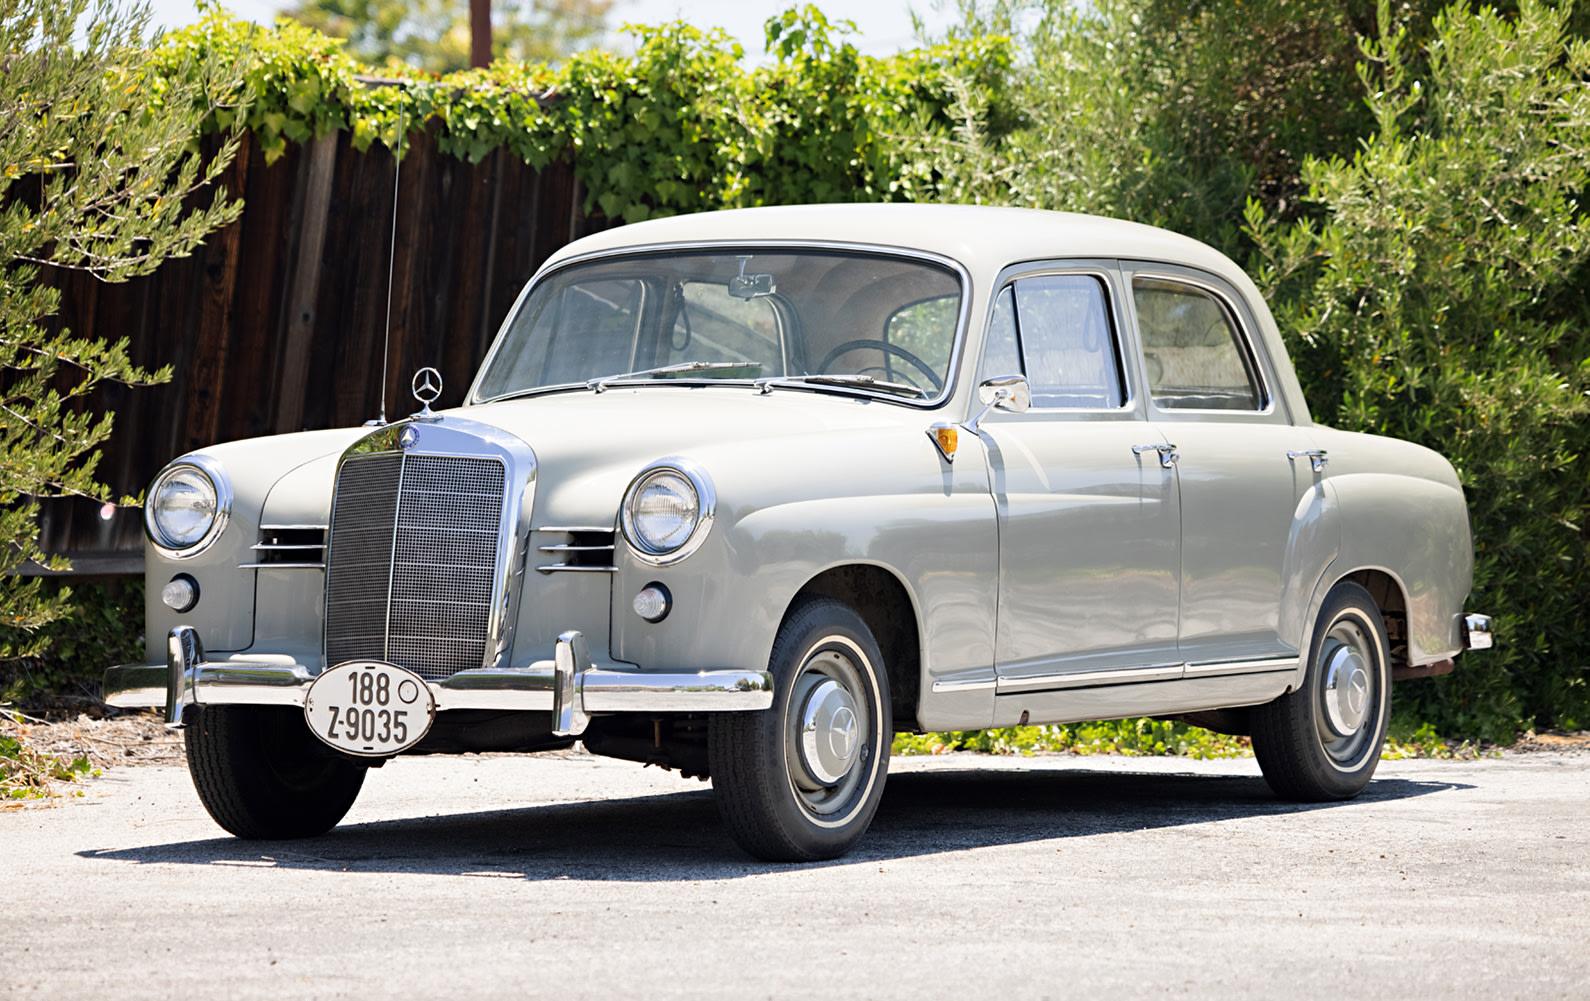 1958 Mercedes-Benz 180 Sedan